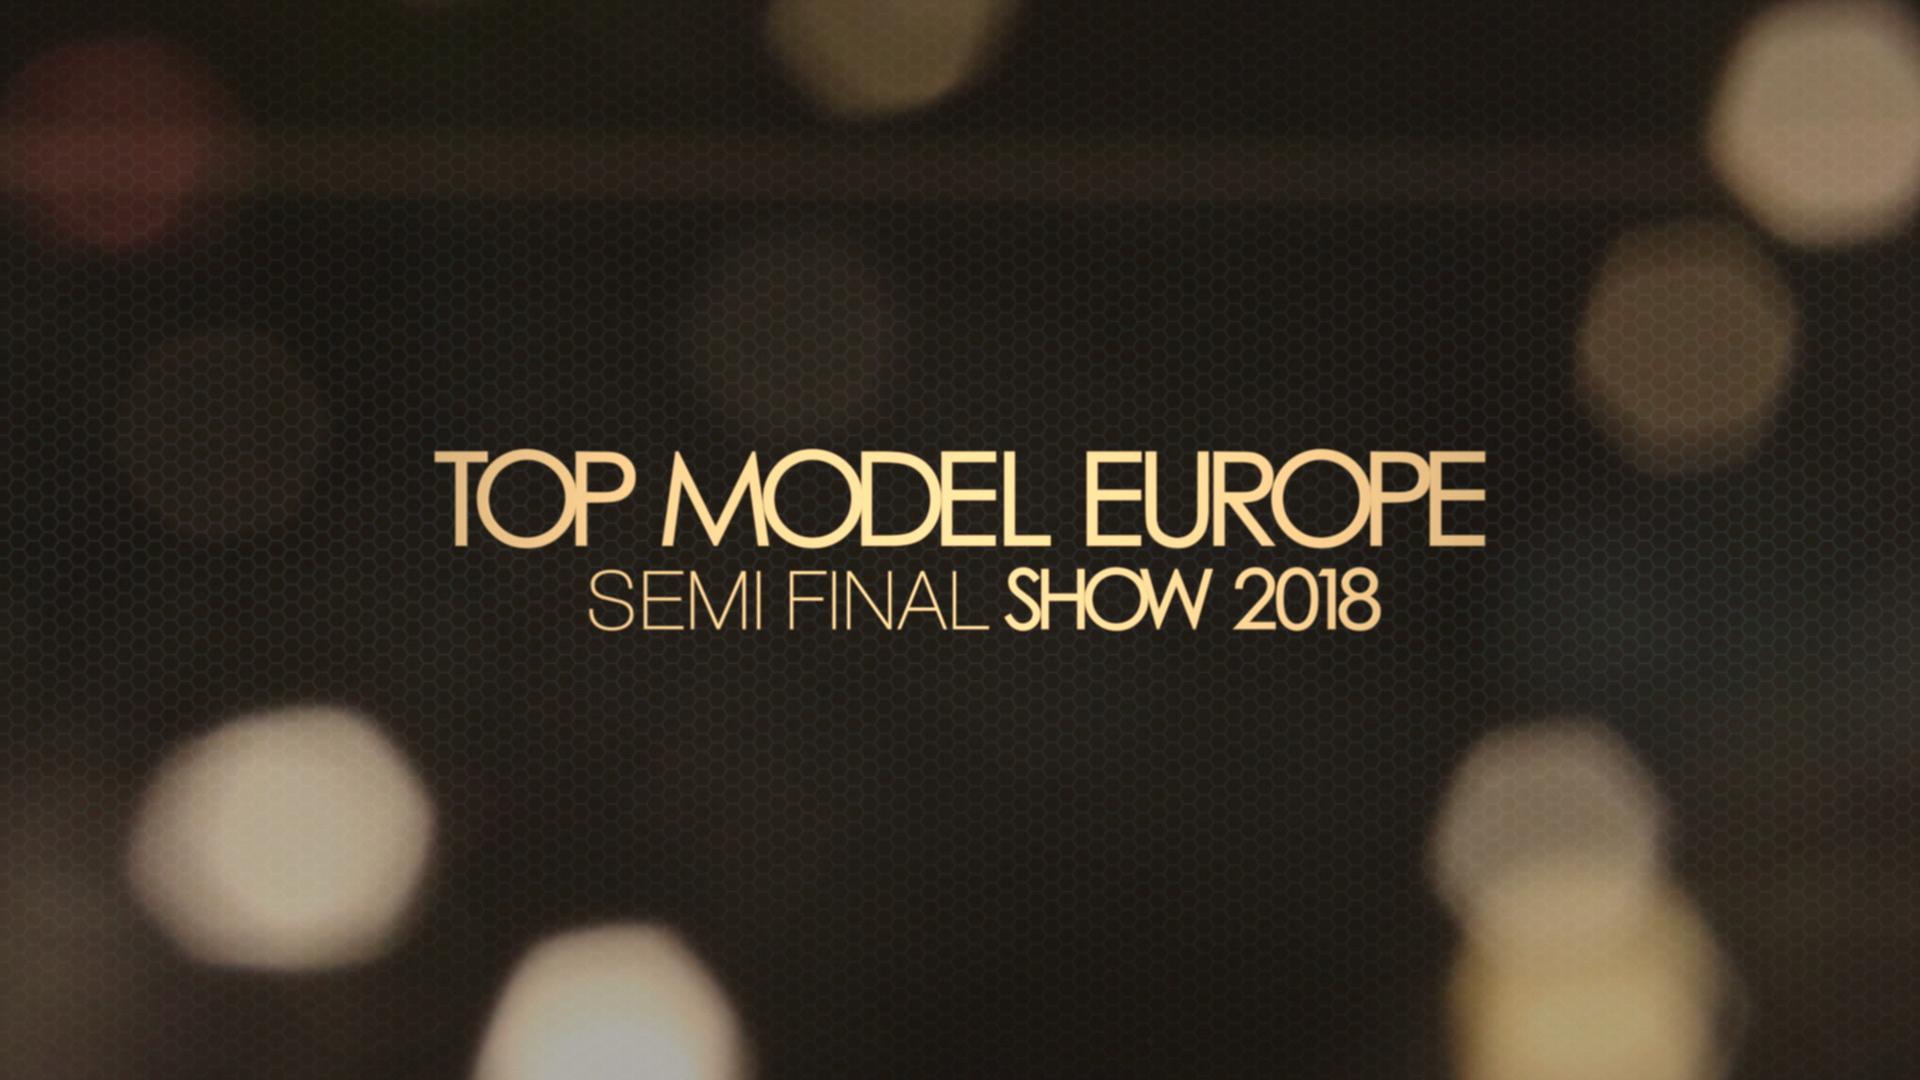 Top Modele Europe 2018 Semi Final Show